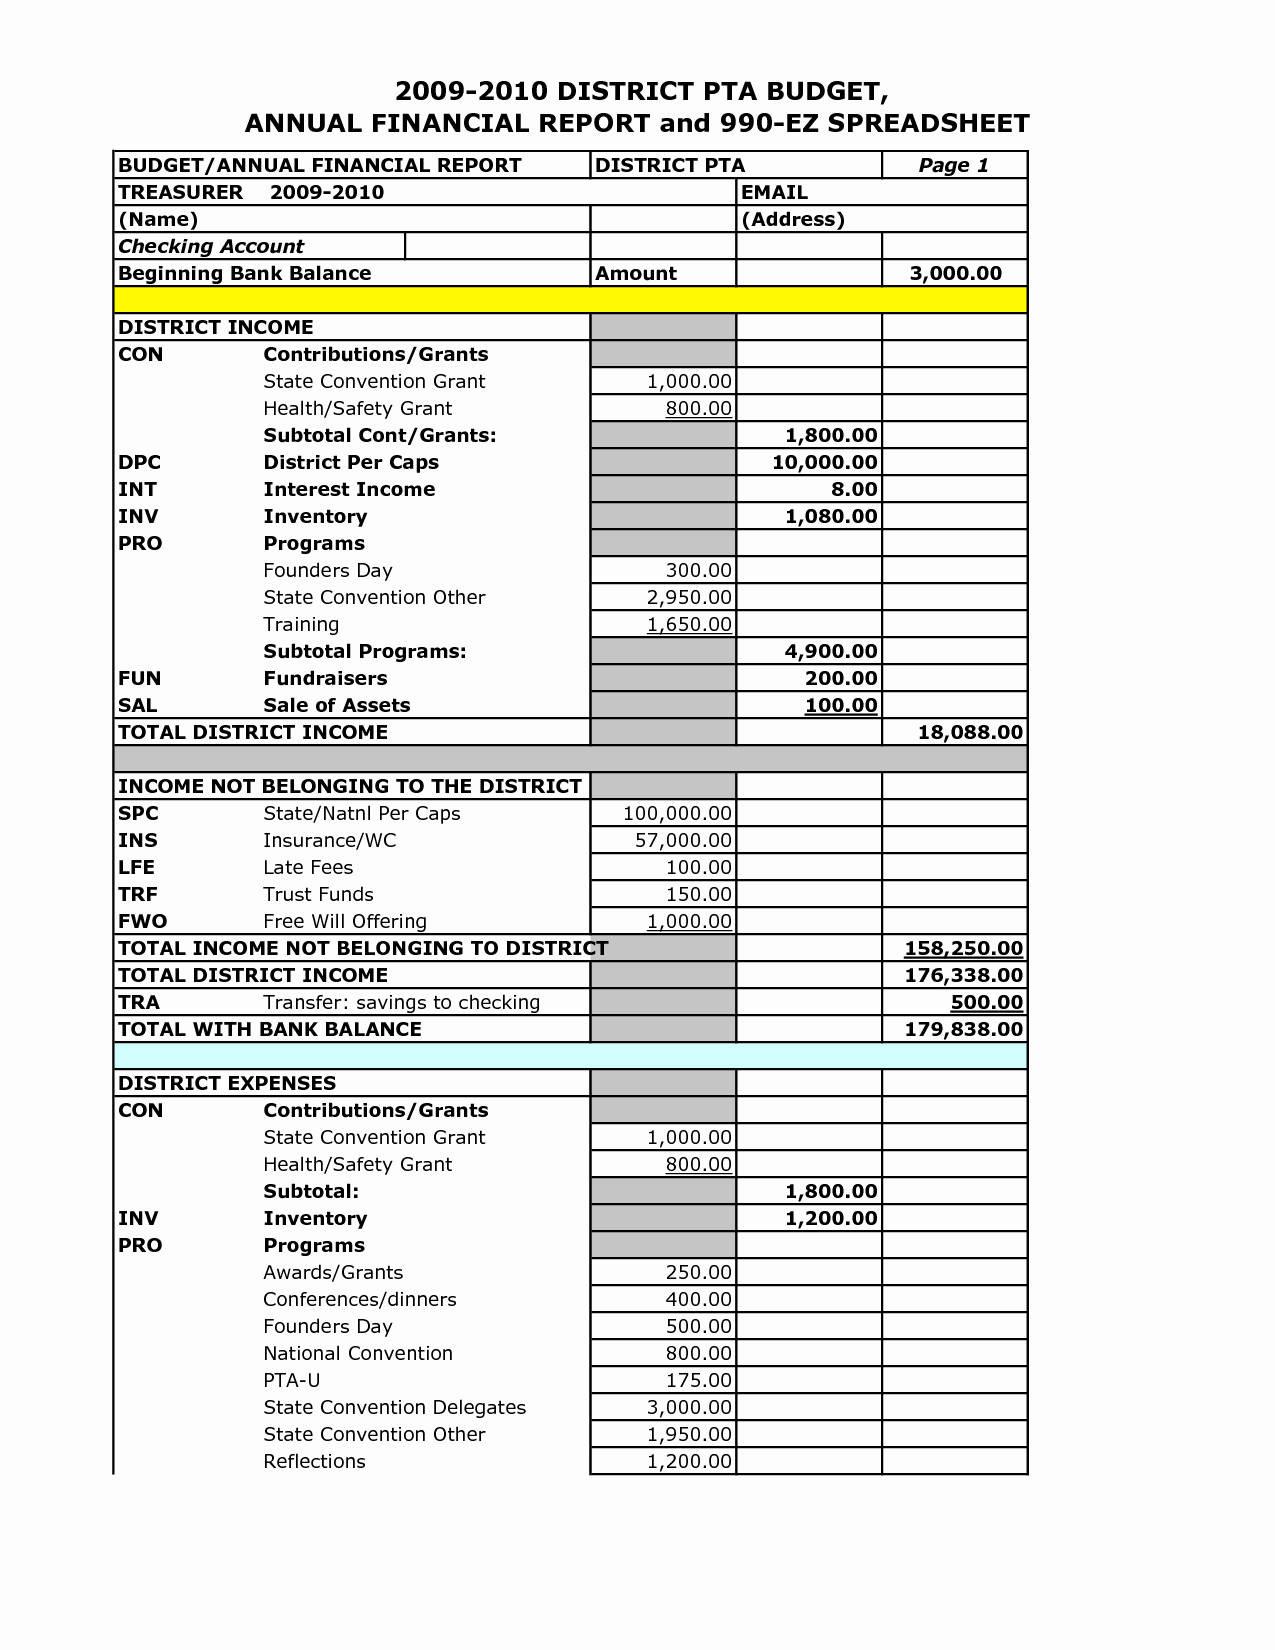 Small Business Tax Preparation Spreadsheet With Small Business Tax Expense Spreadsheet Income Preparation Return